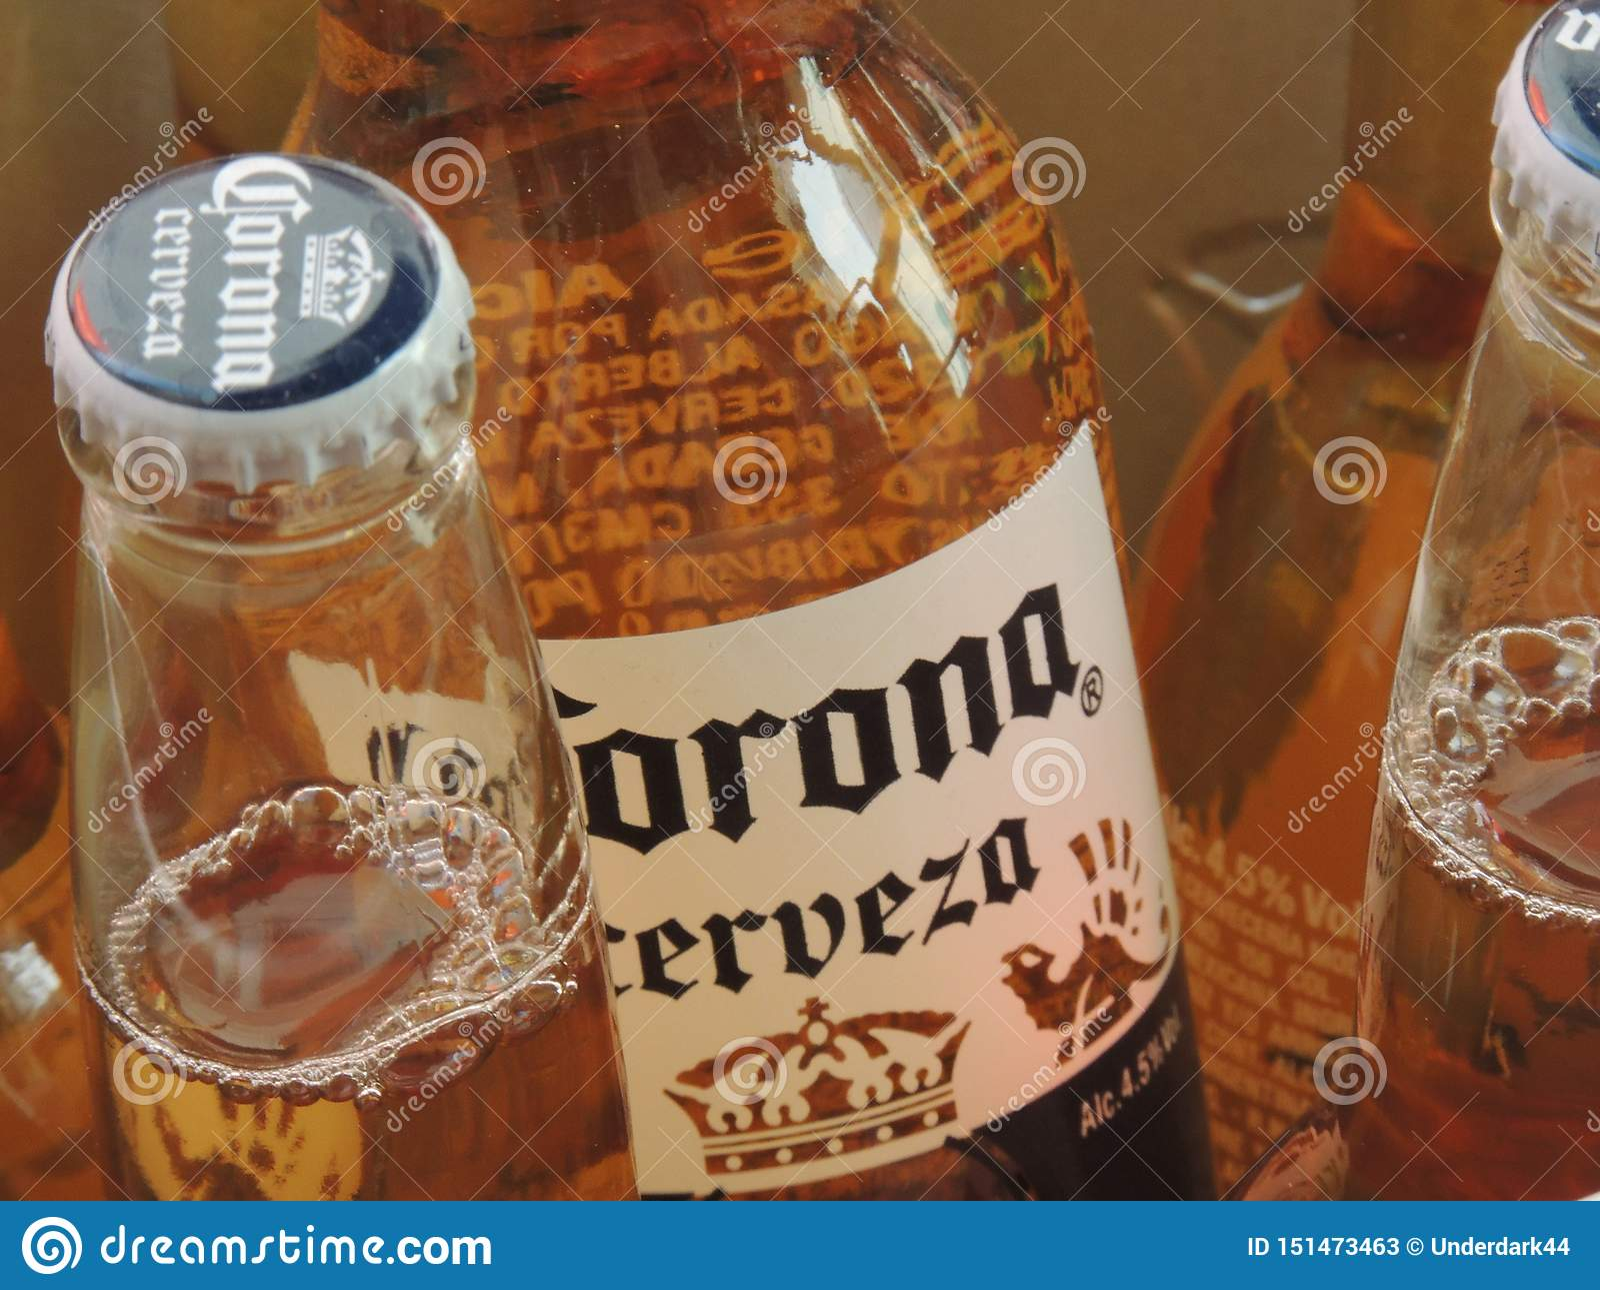 beer corona cerveza bottle